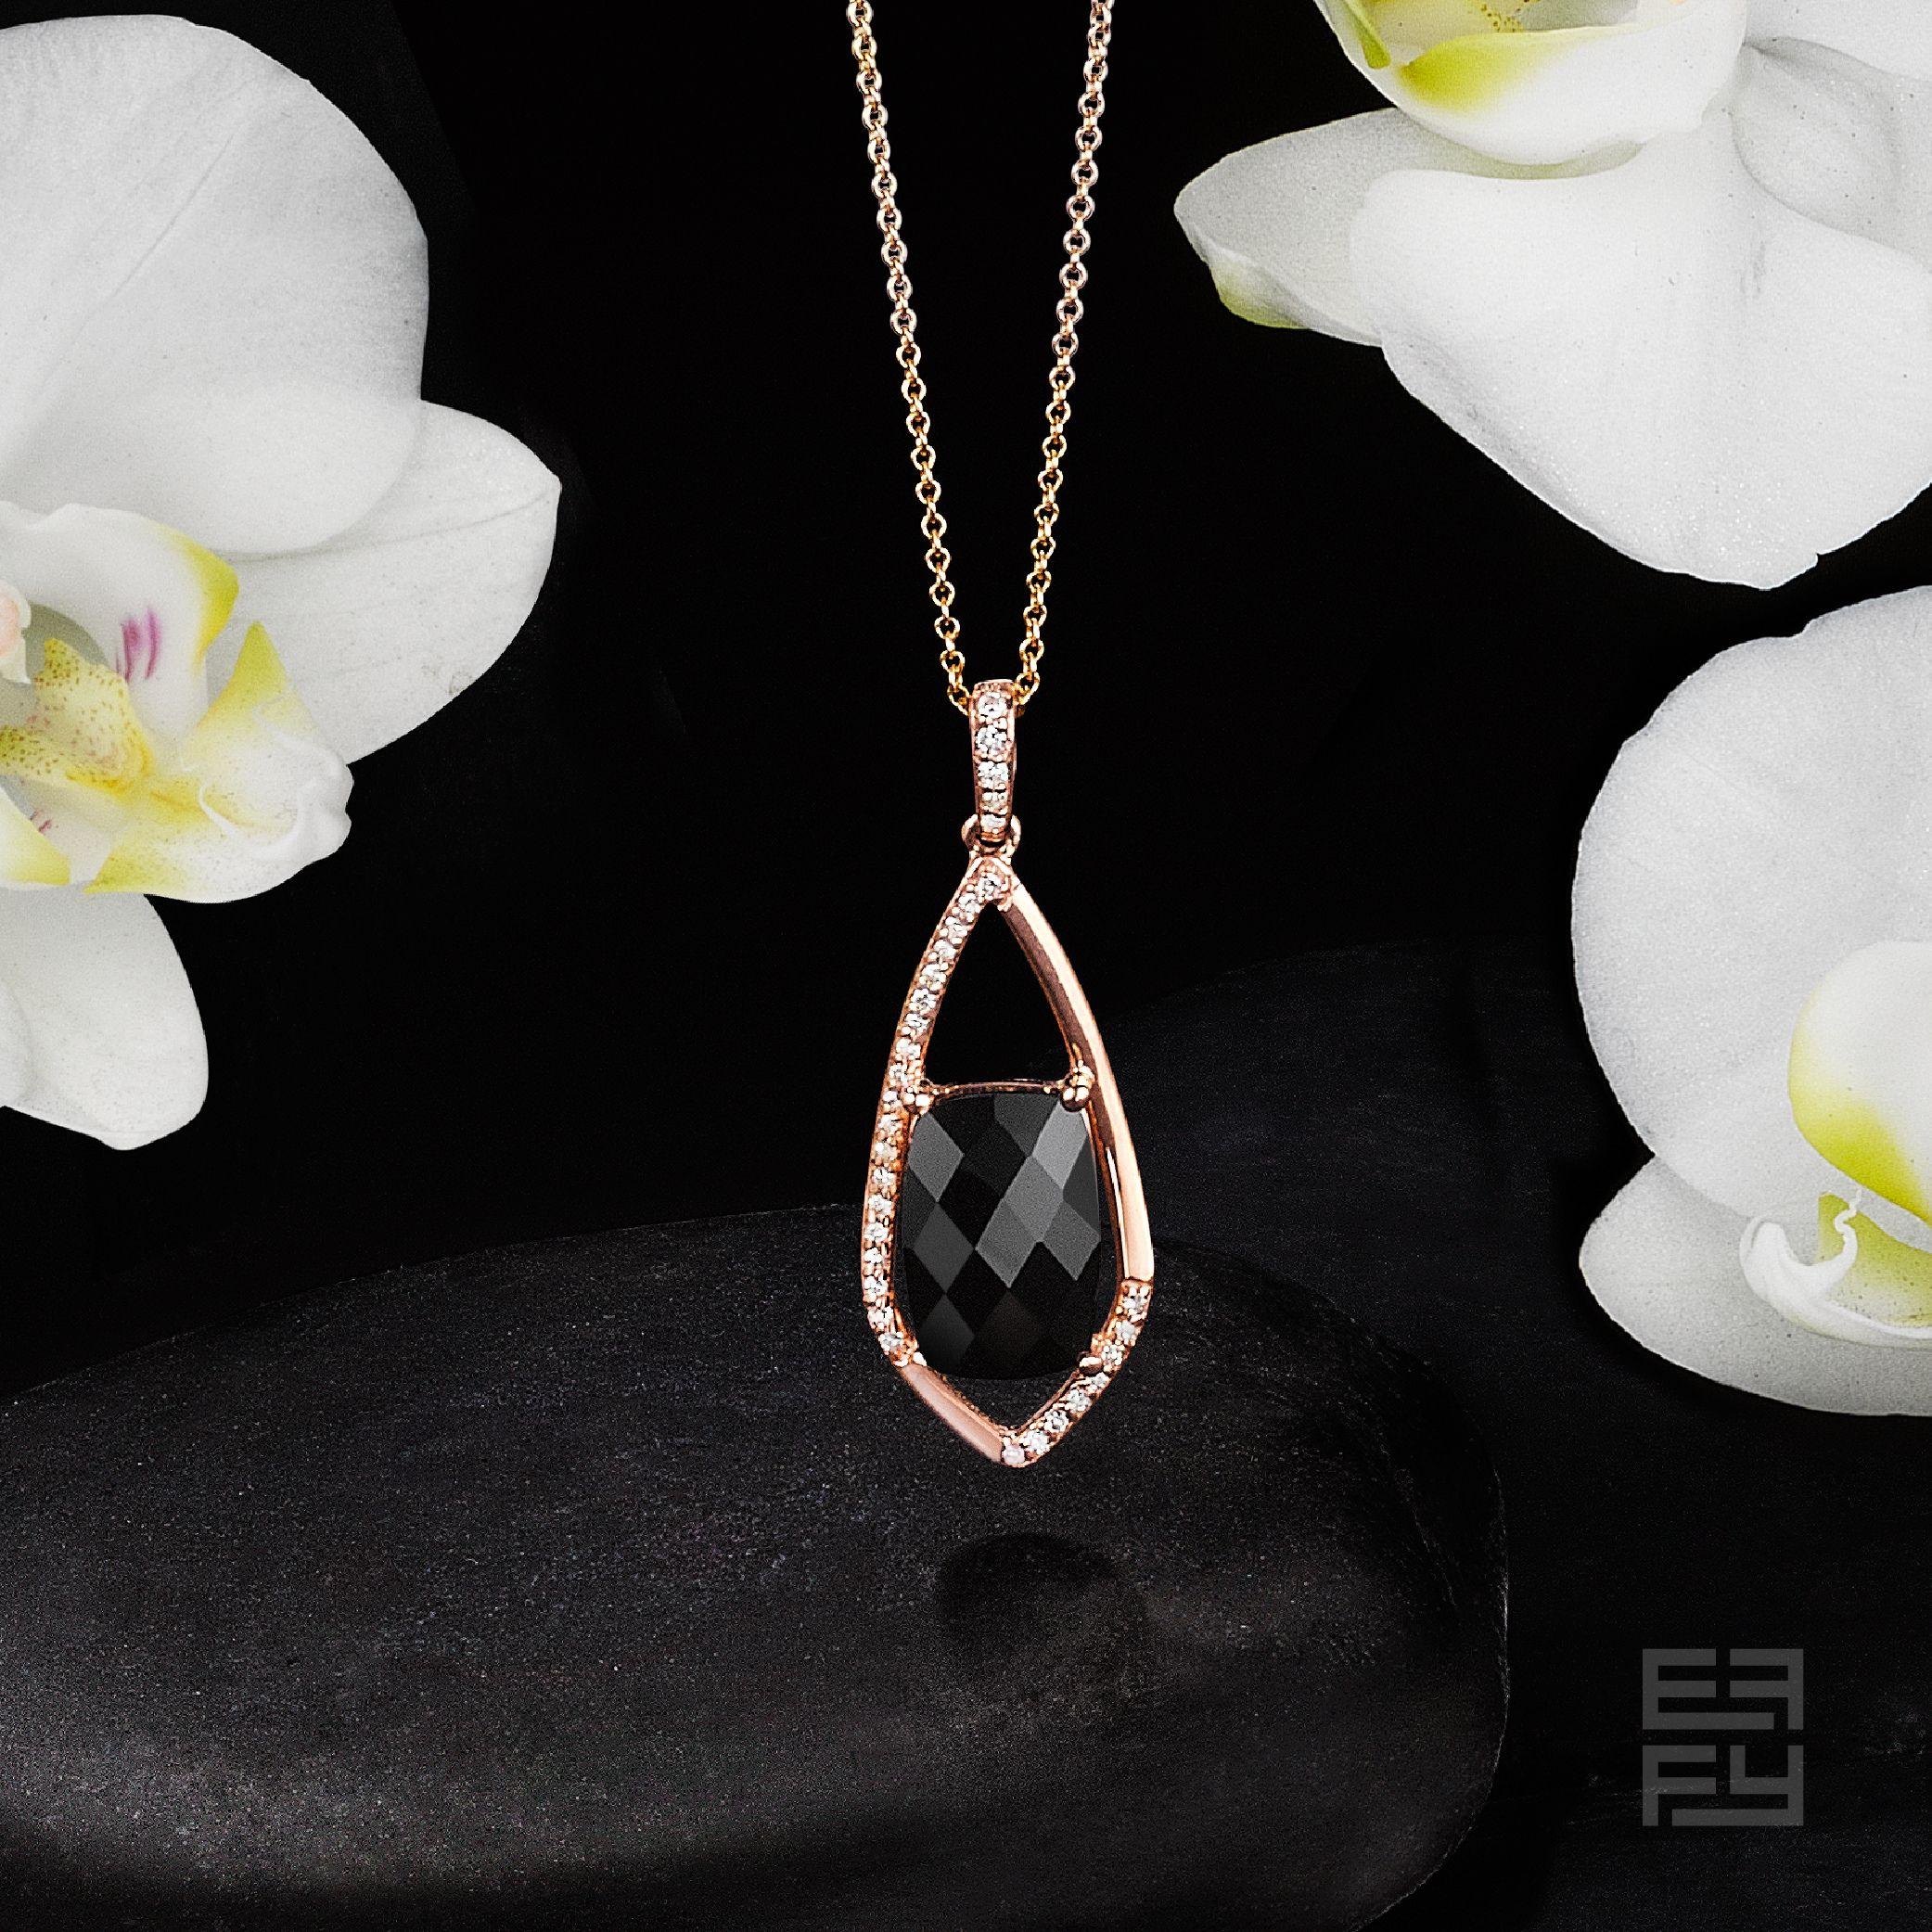 25+ Where can i buy effy jewelry info